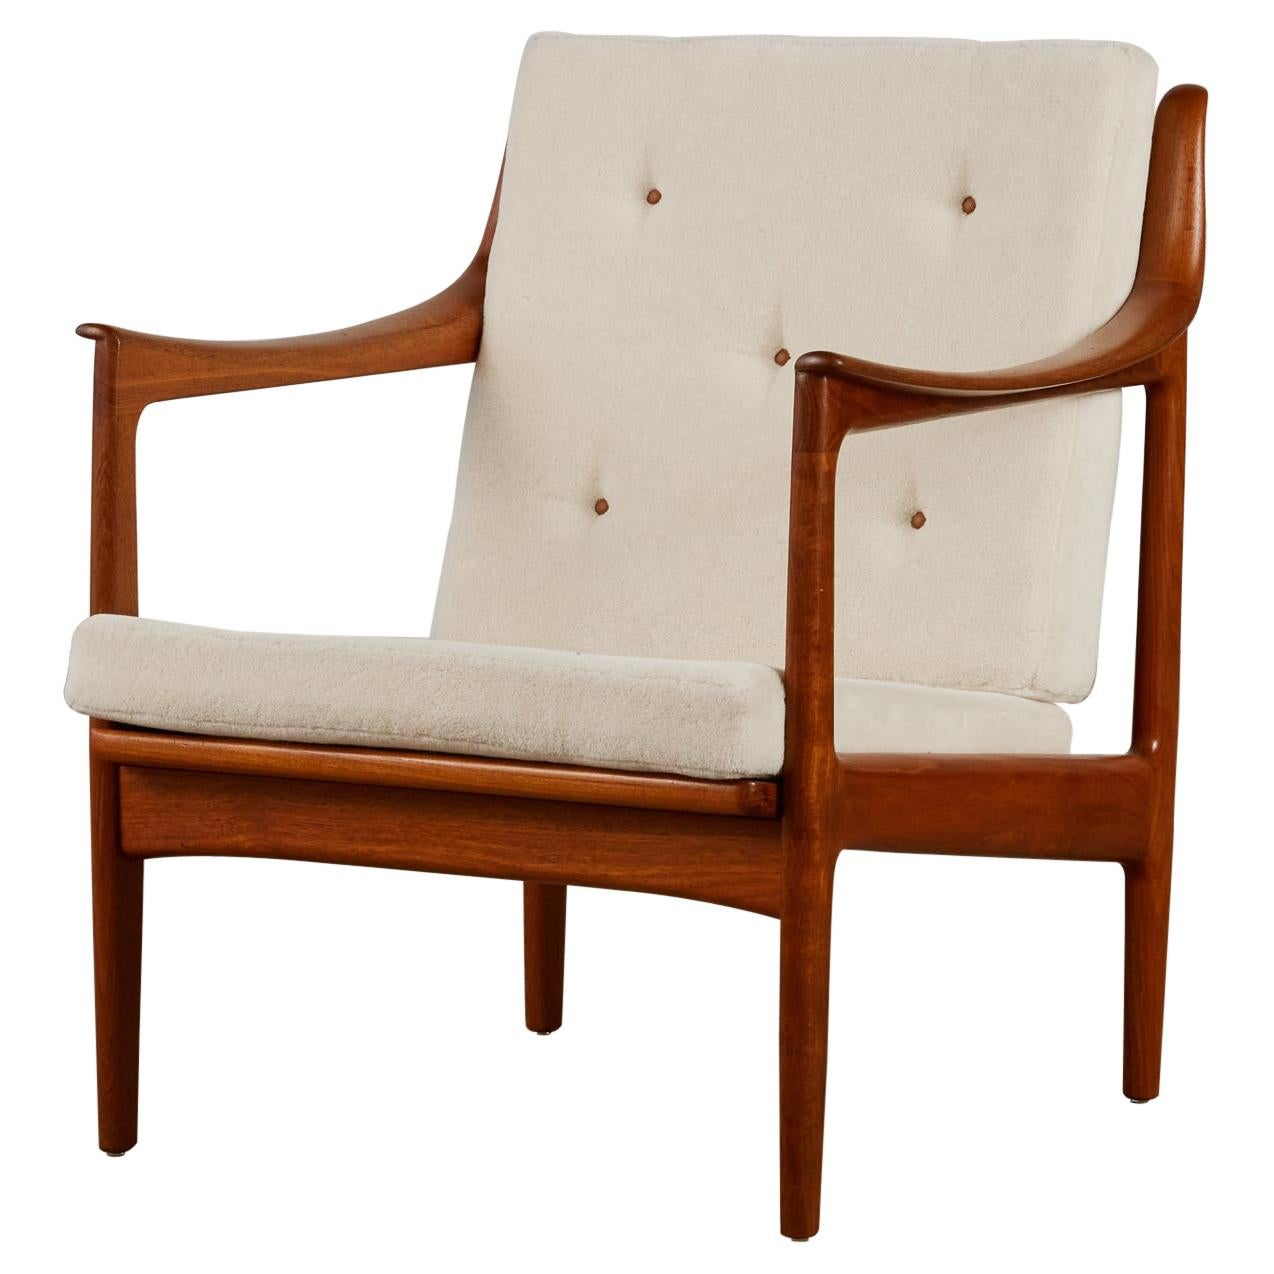 Gerhard Berg Lounge Chair for Westnofa